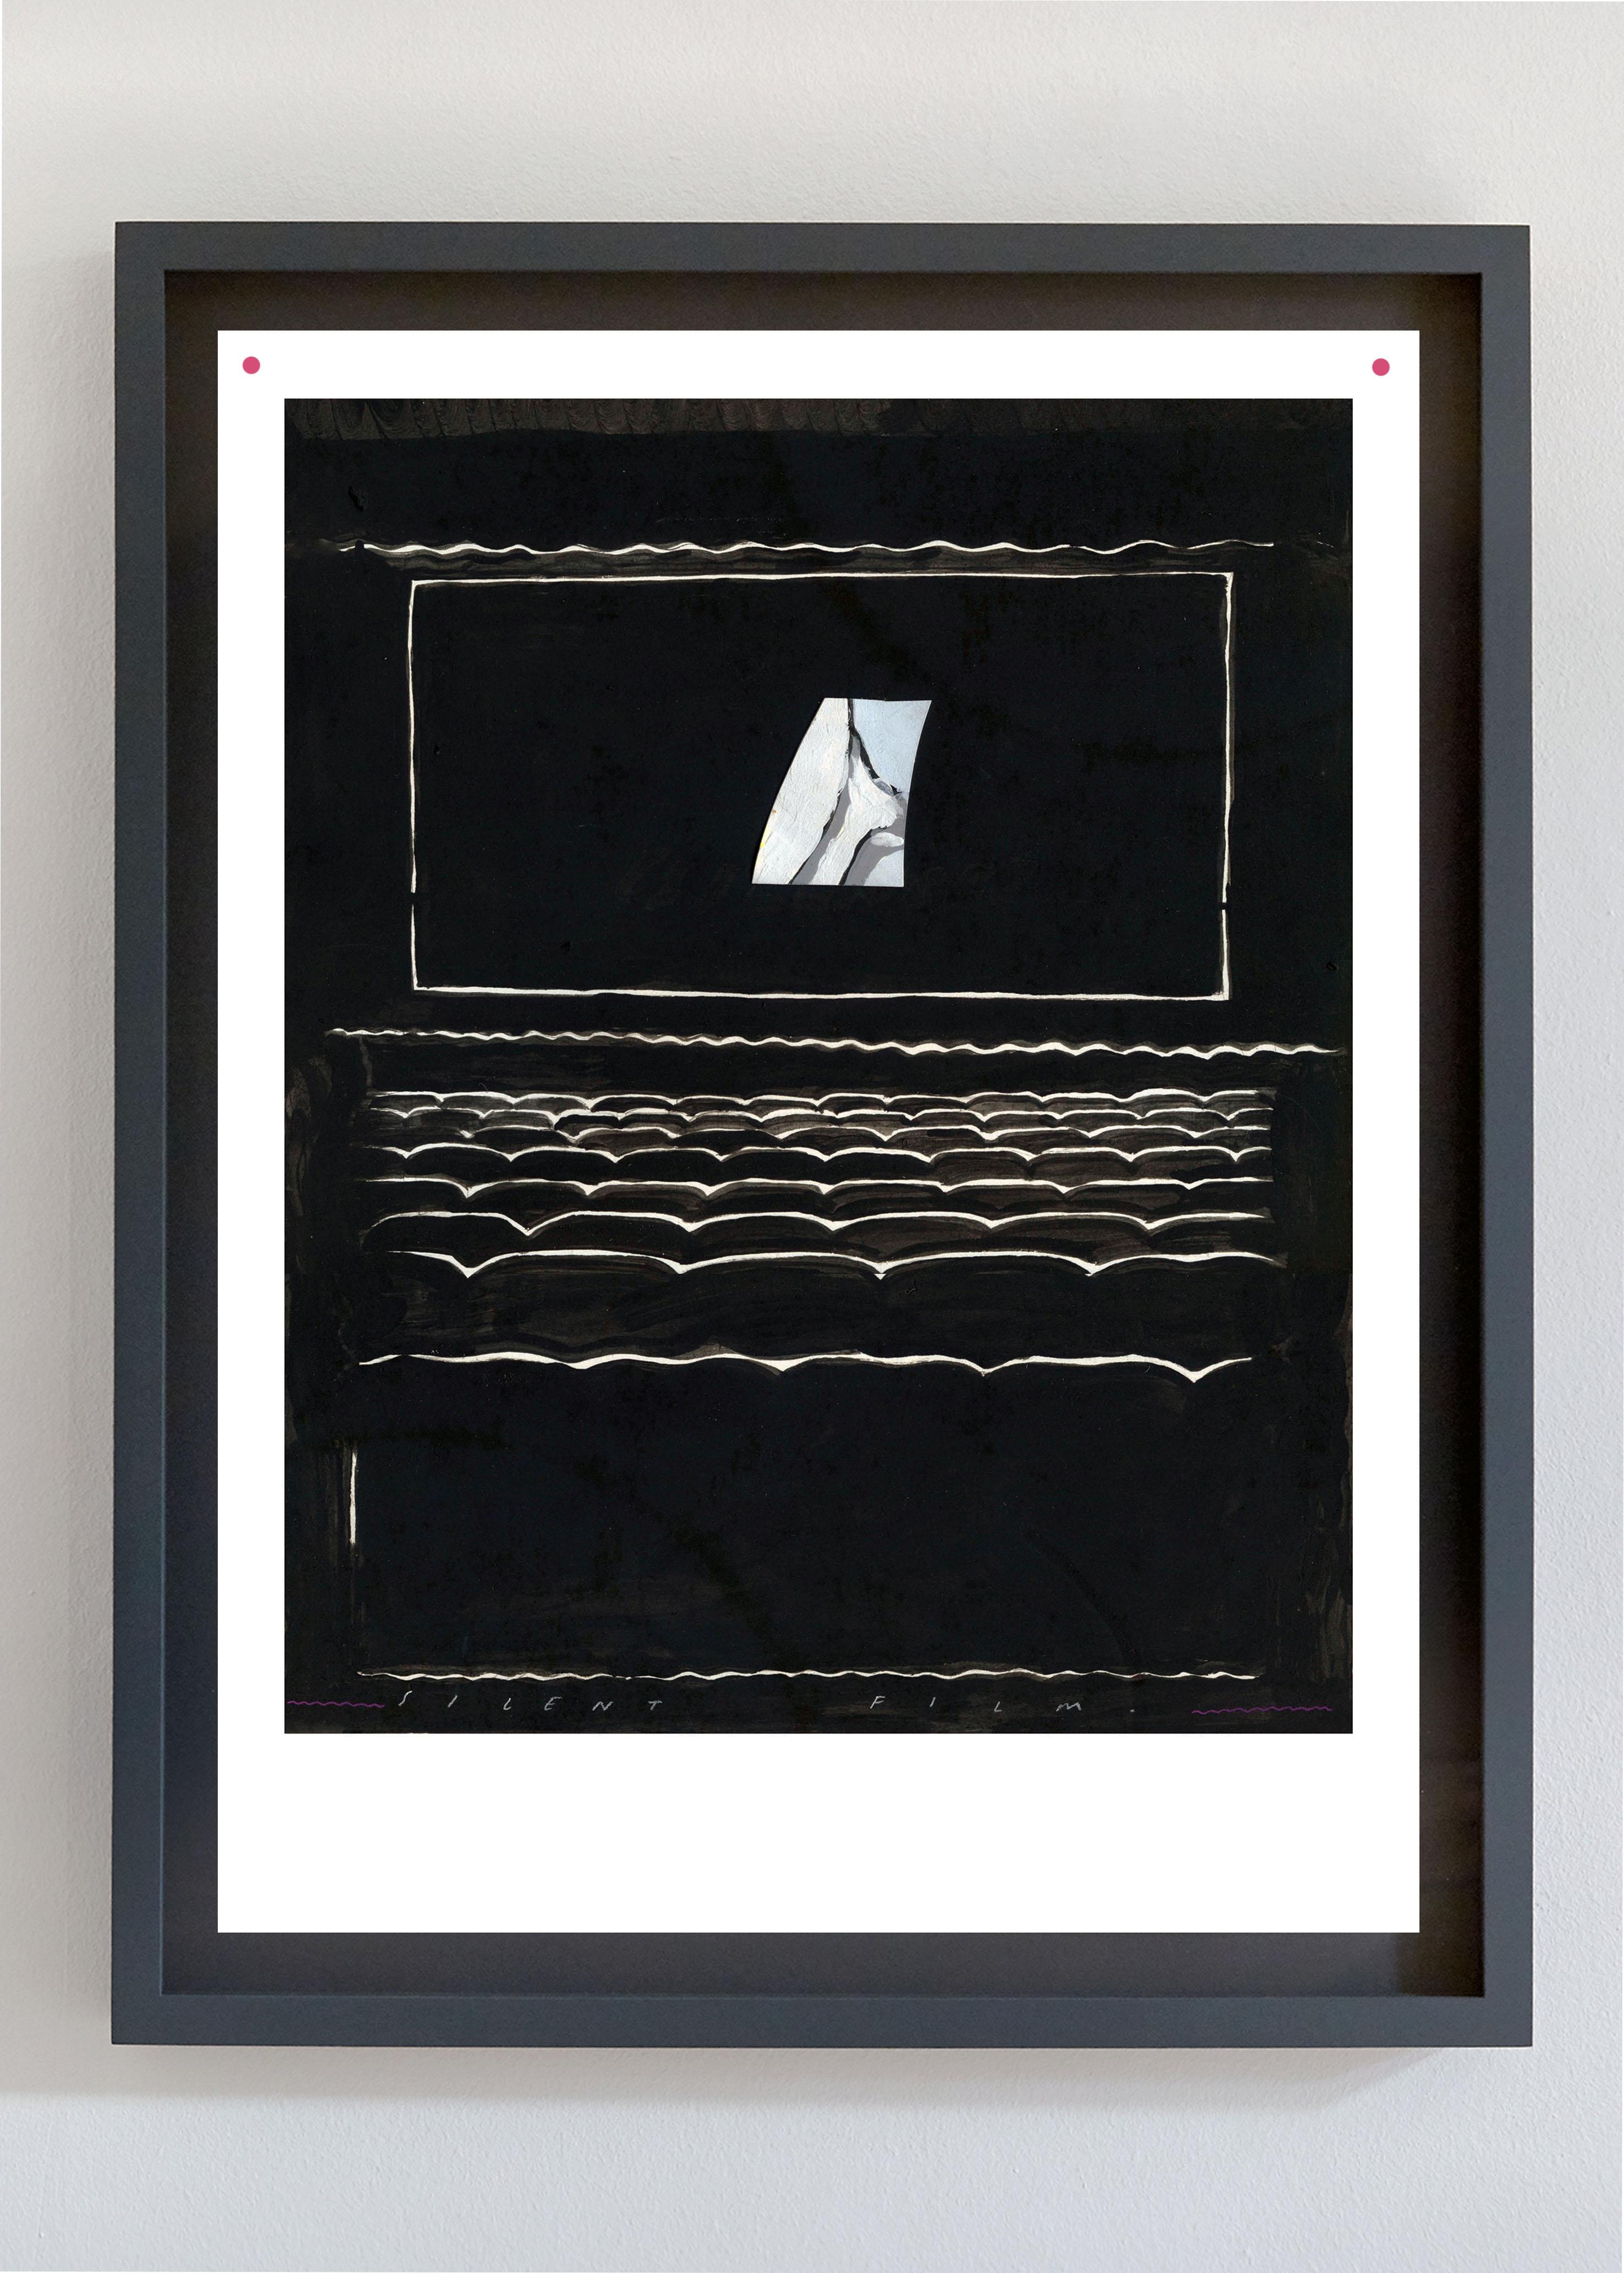 Charlie Godet Thomas, Silent Film, 2019. Gicleé print on Hahnemühle Photo Rag. Framed. 48 x 36 cm. Edition of 30 (+ 3 AP).